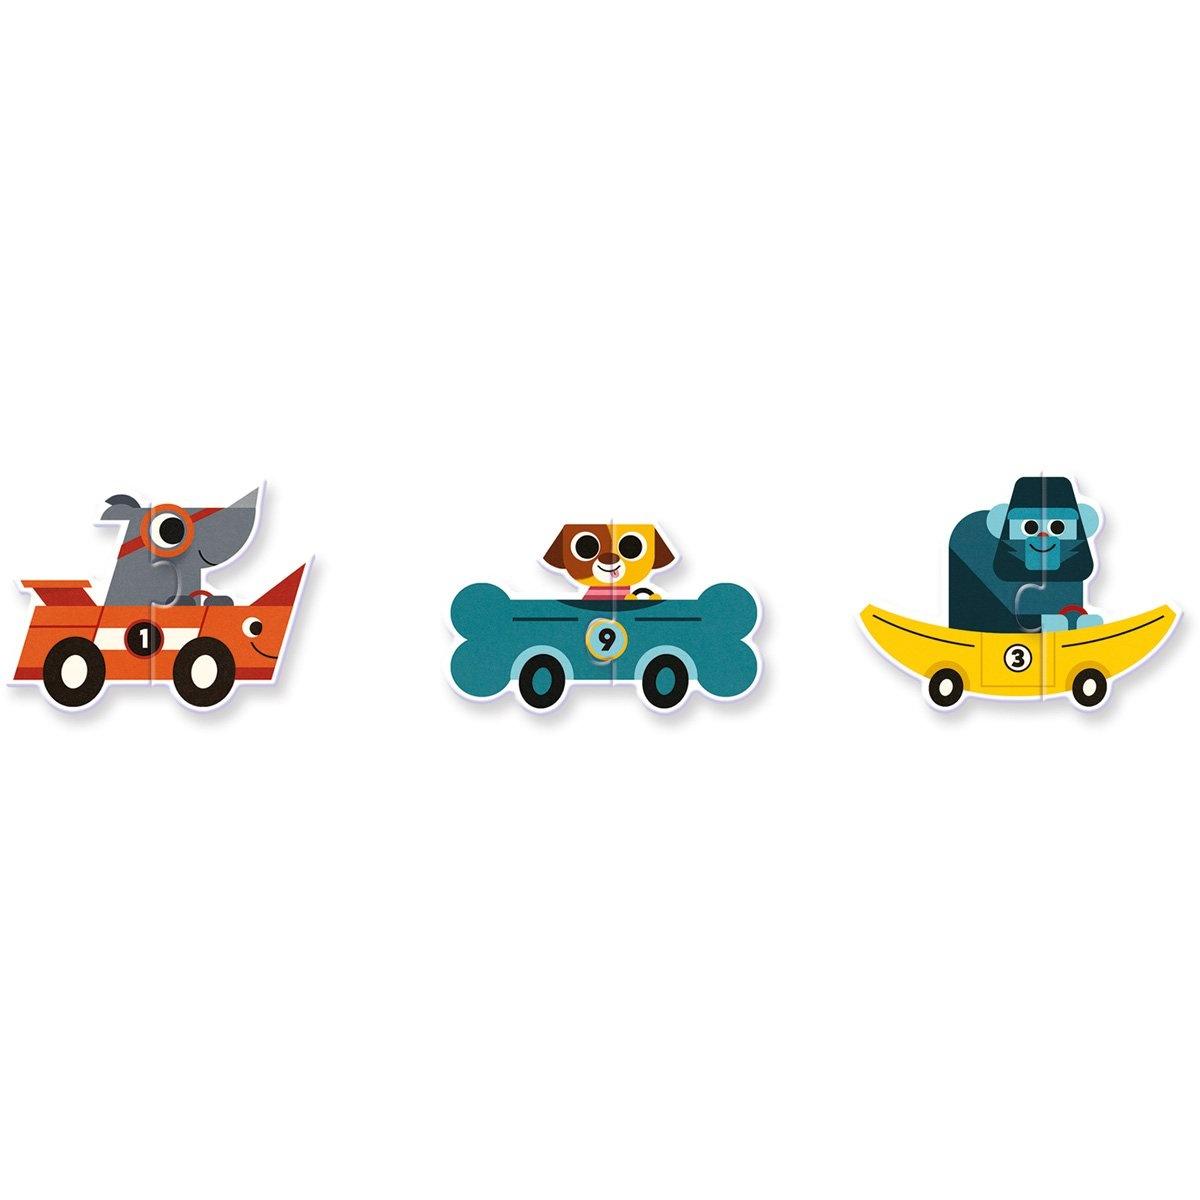 Djeco Djeco Duo puzzel - Racewagens - 10 puzzels 2y+